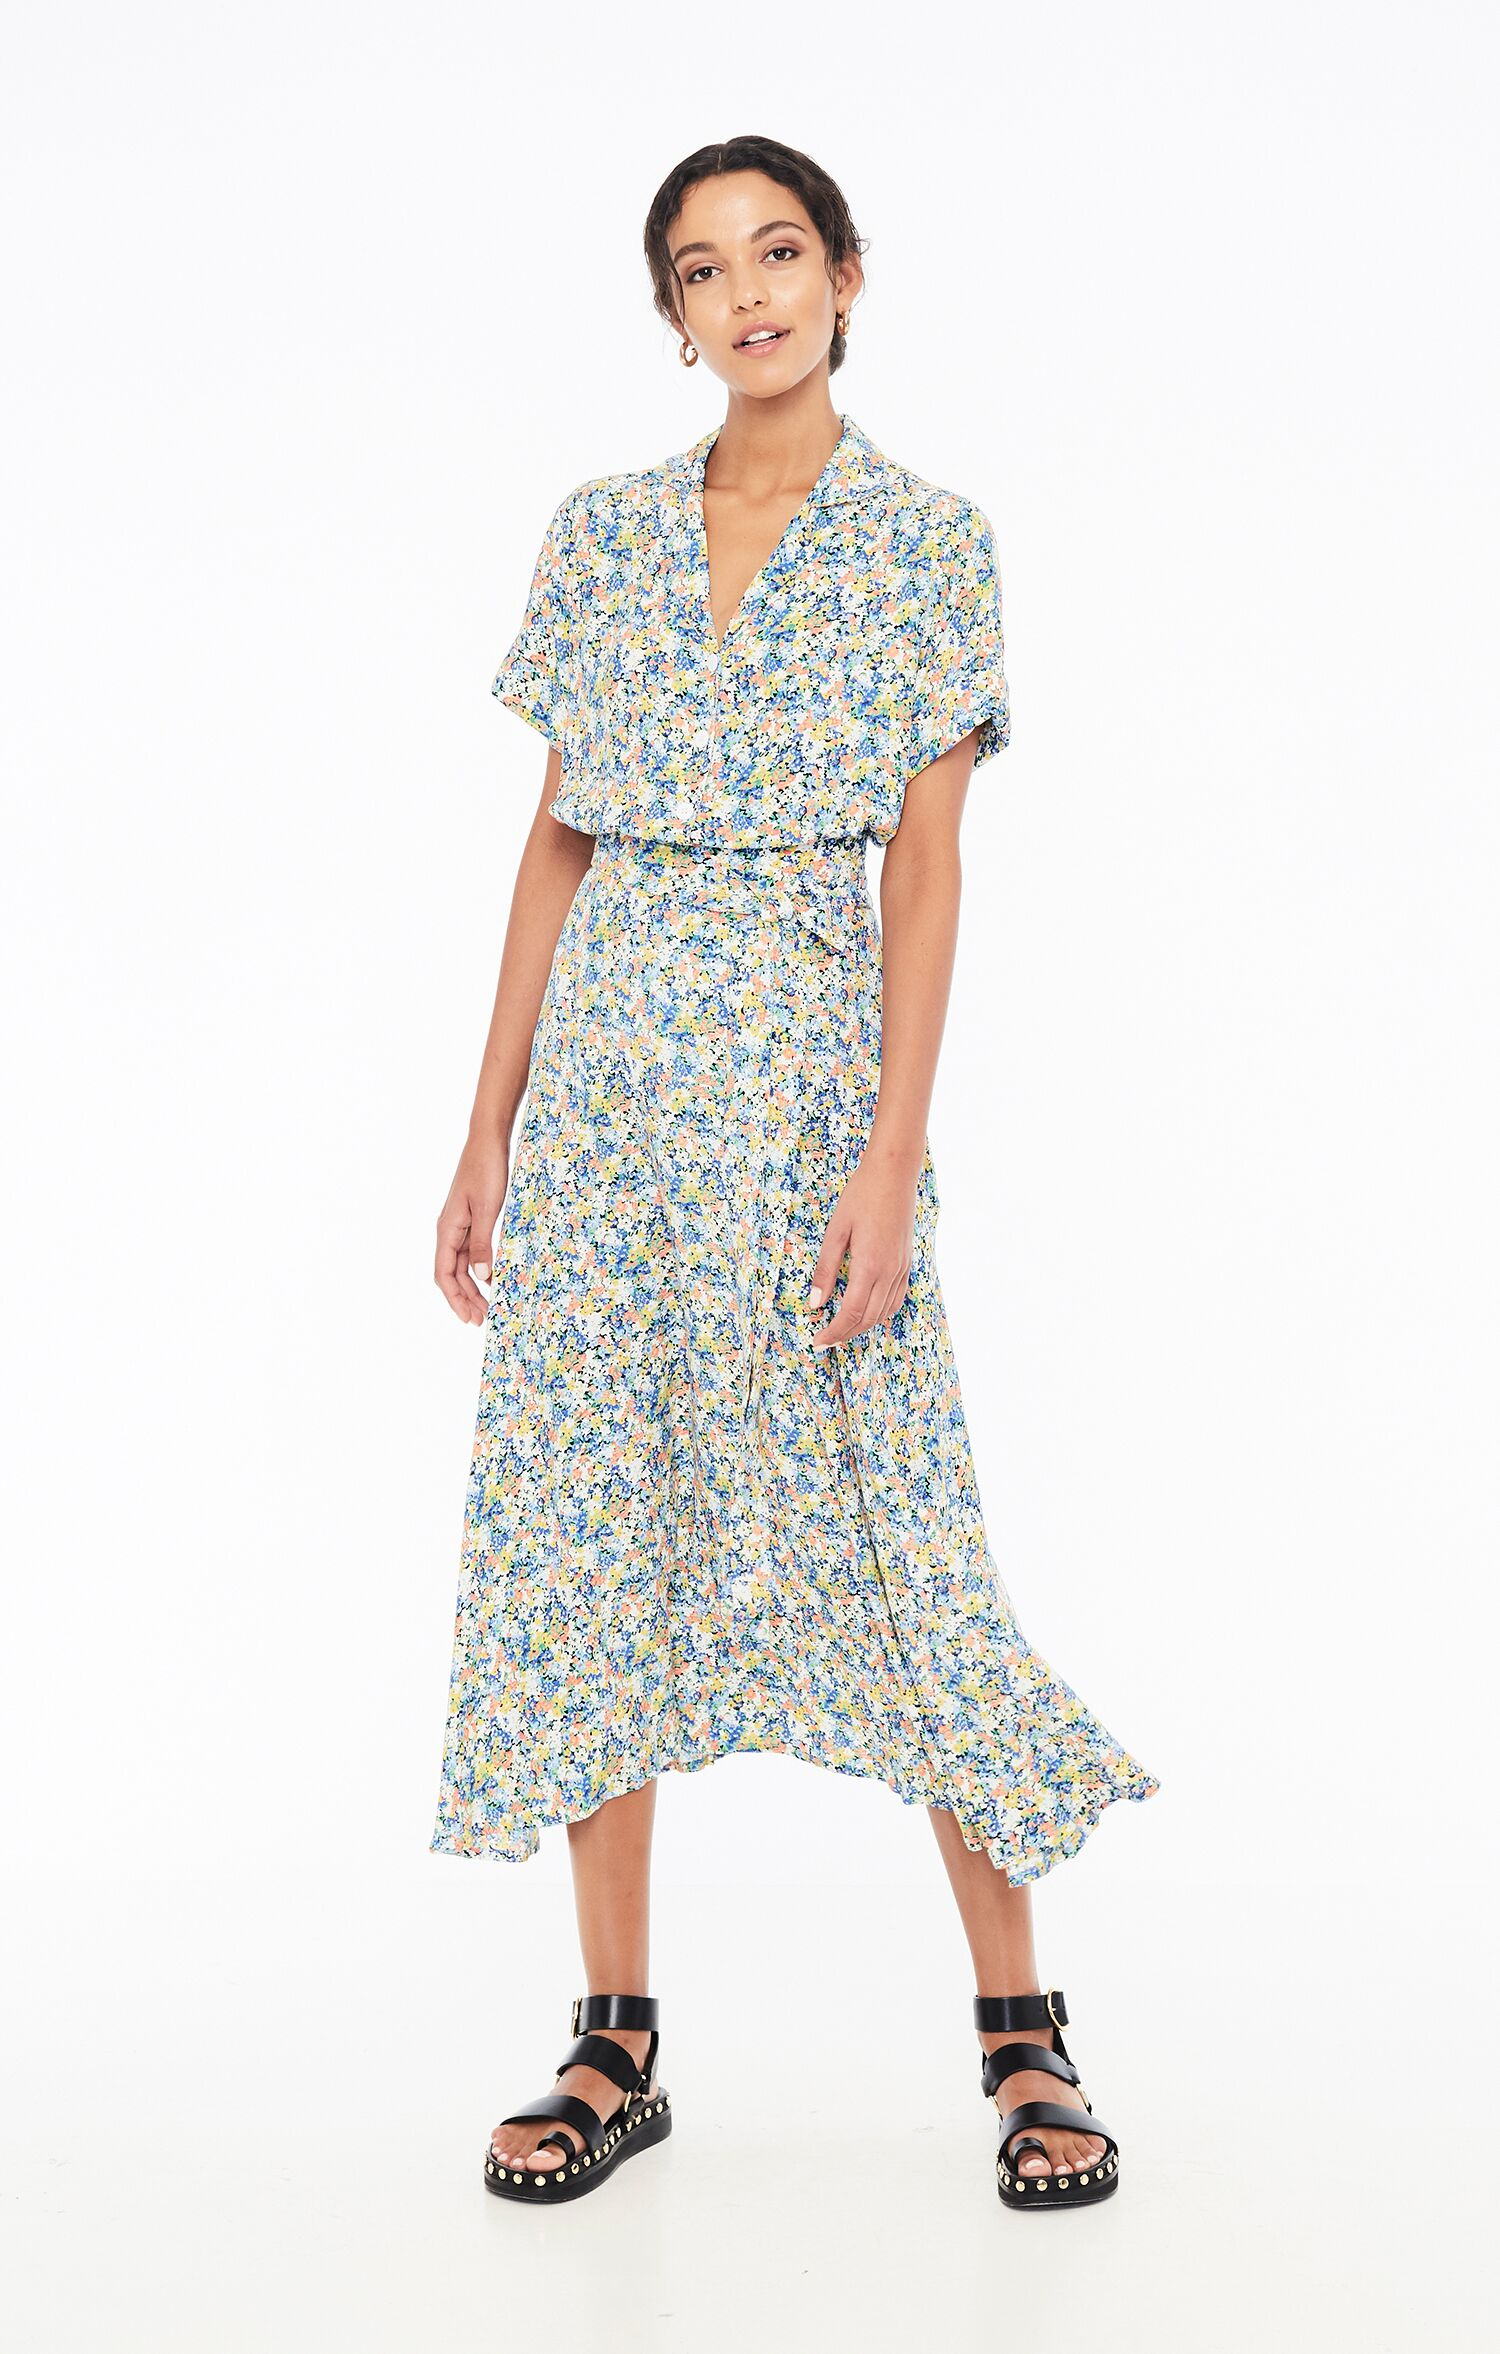 Ostuni Shirt - Vionett Floral Print